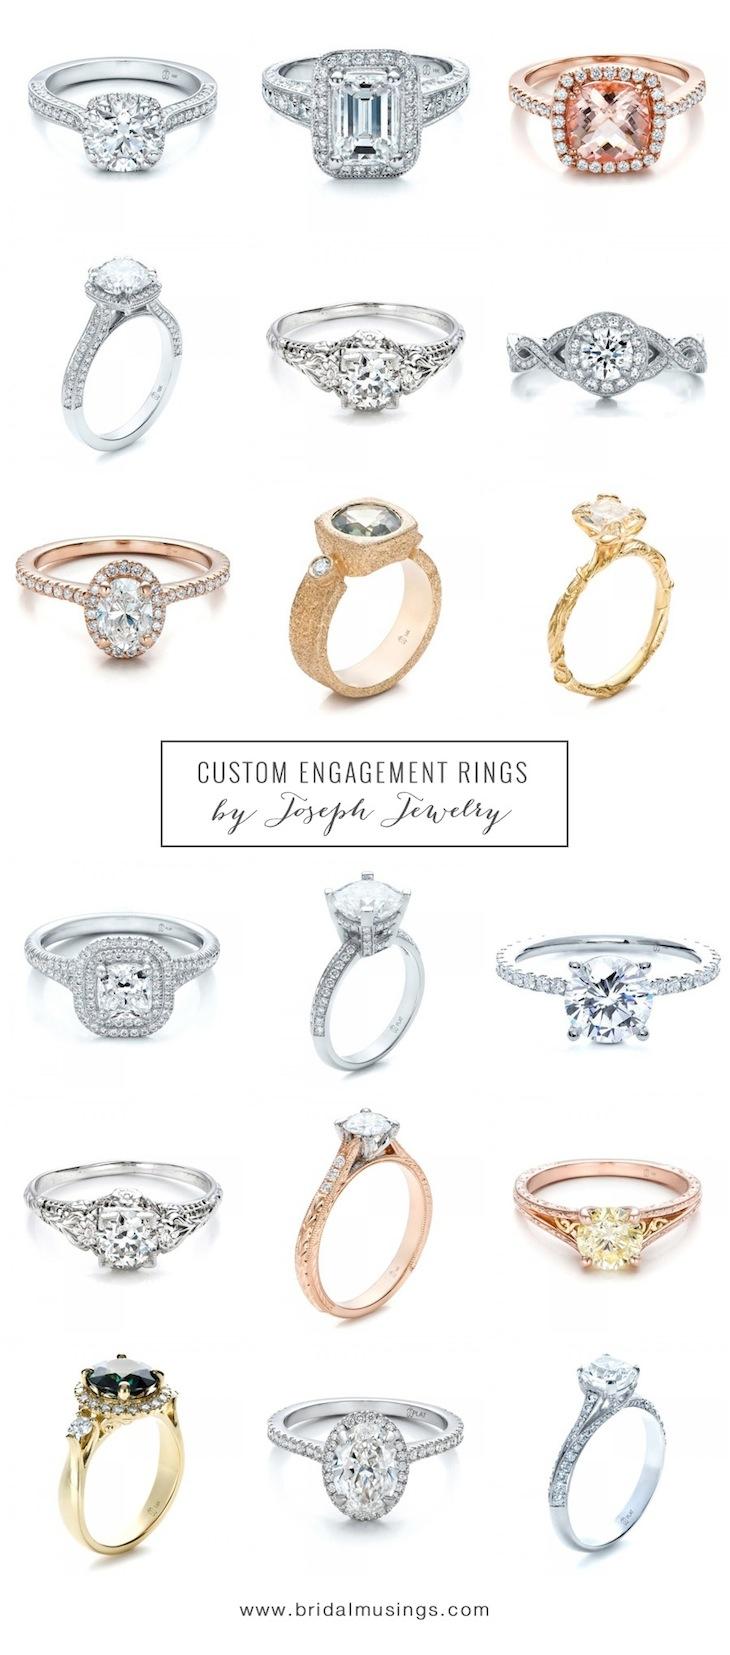 Custom Jewelry Business Plan Sample - Company Summary | Bplans